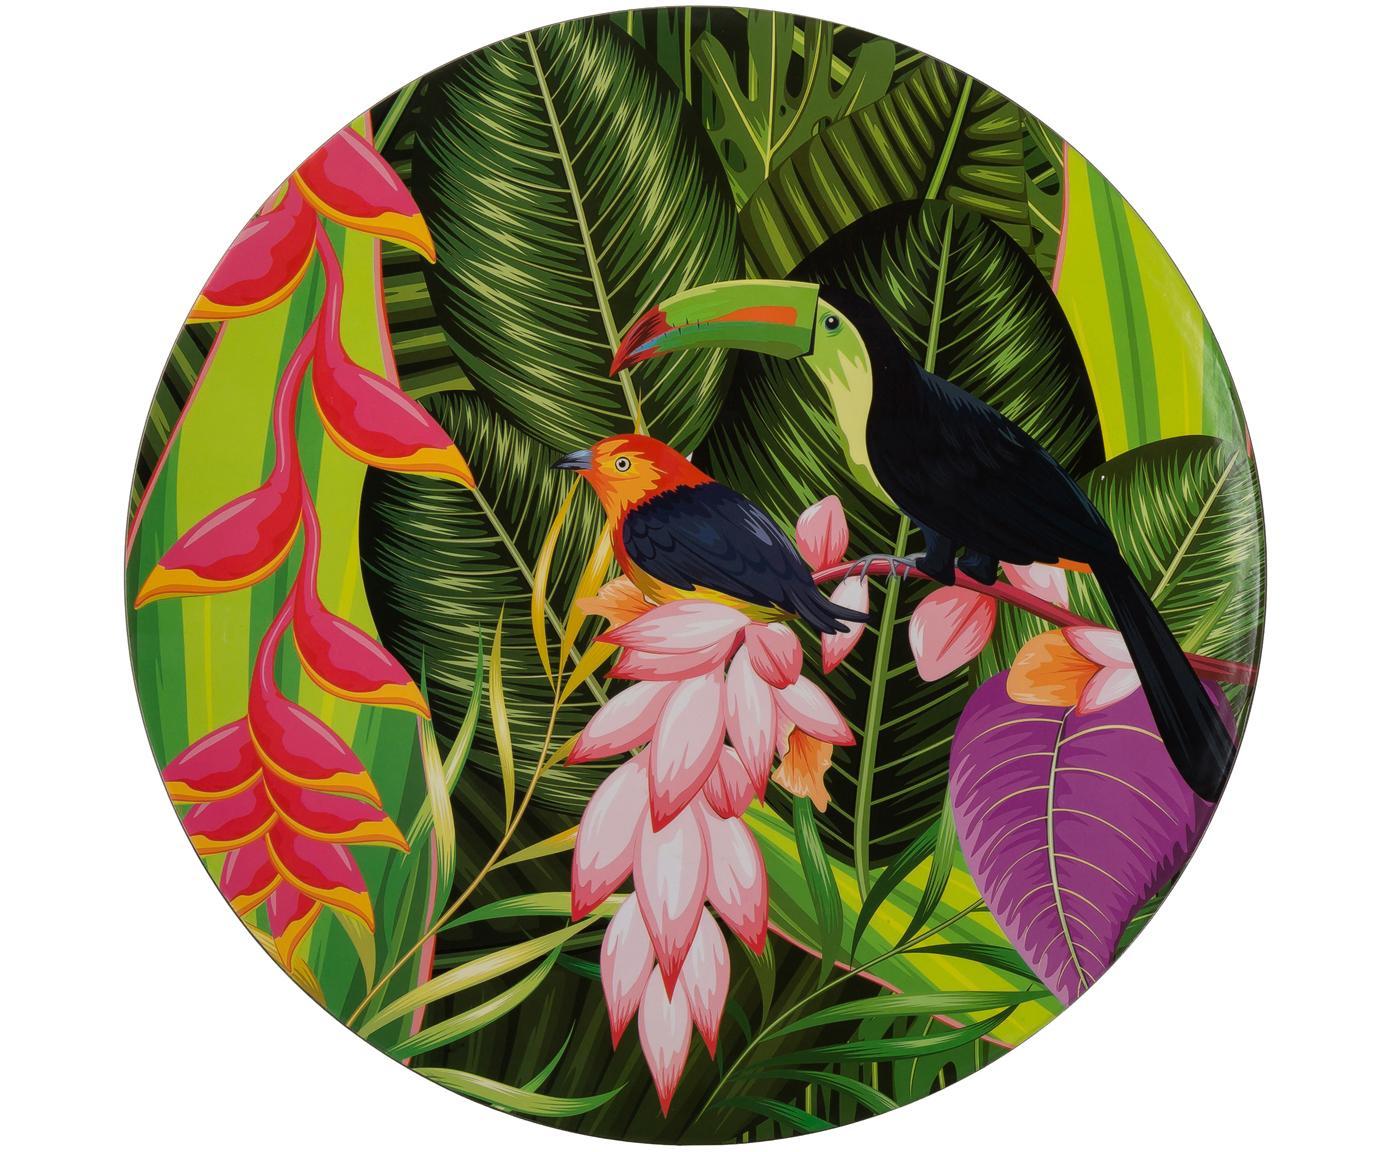 Bajoplato Tropical Bird, 2uds., Polipropileno, con papel recubierto, Tonos verdes, rosa, lila, naranja, negro, Ø 33 cm